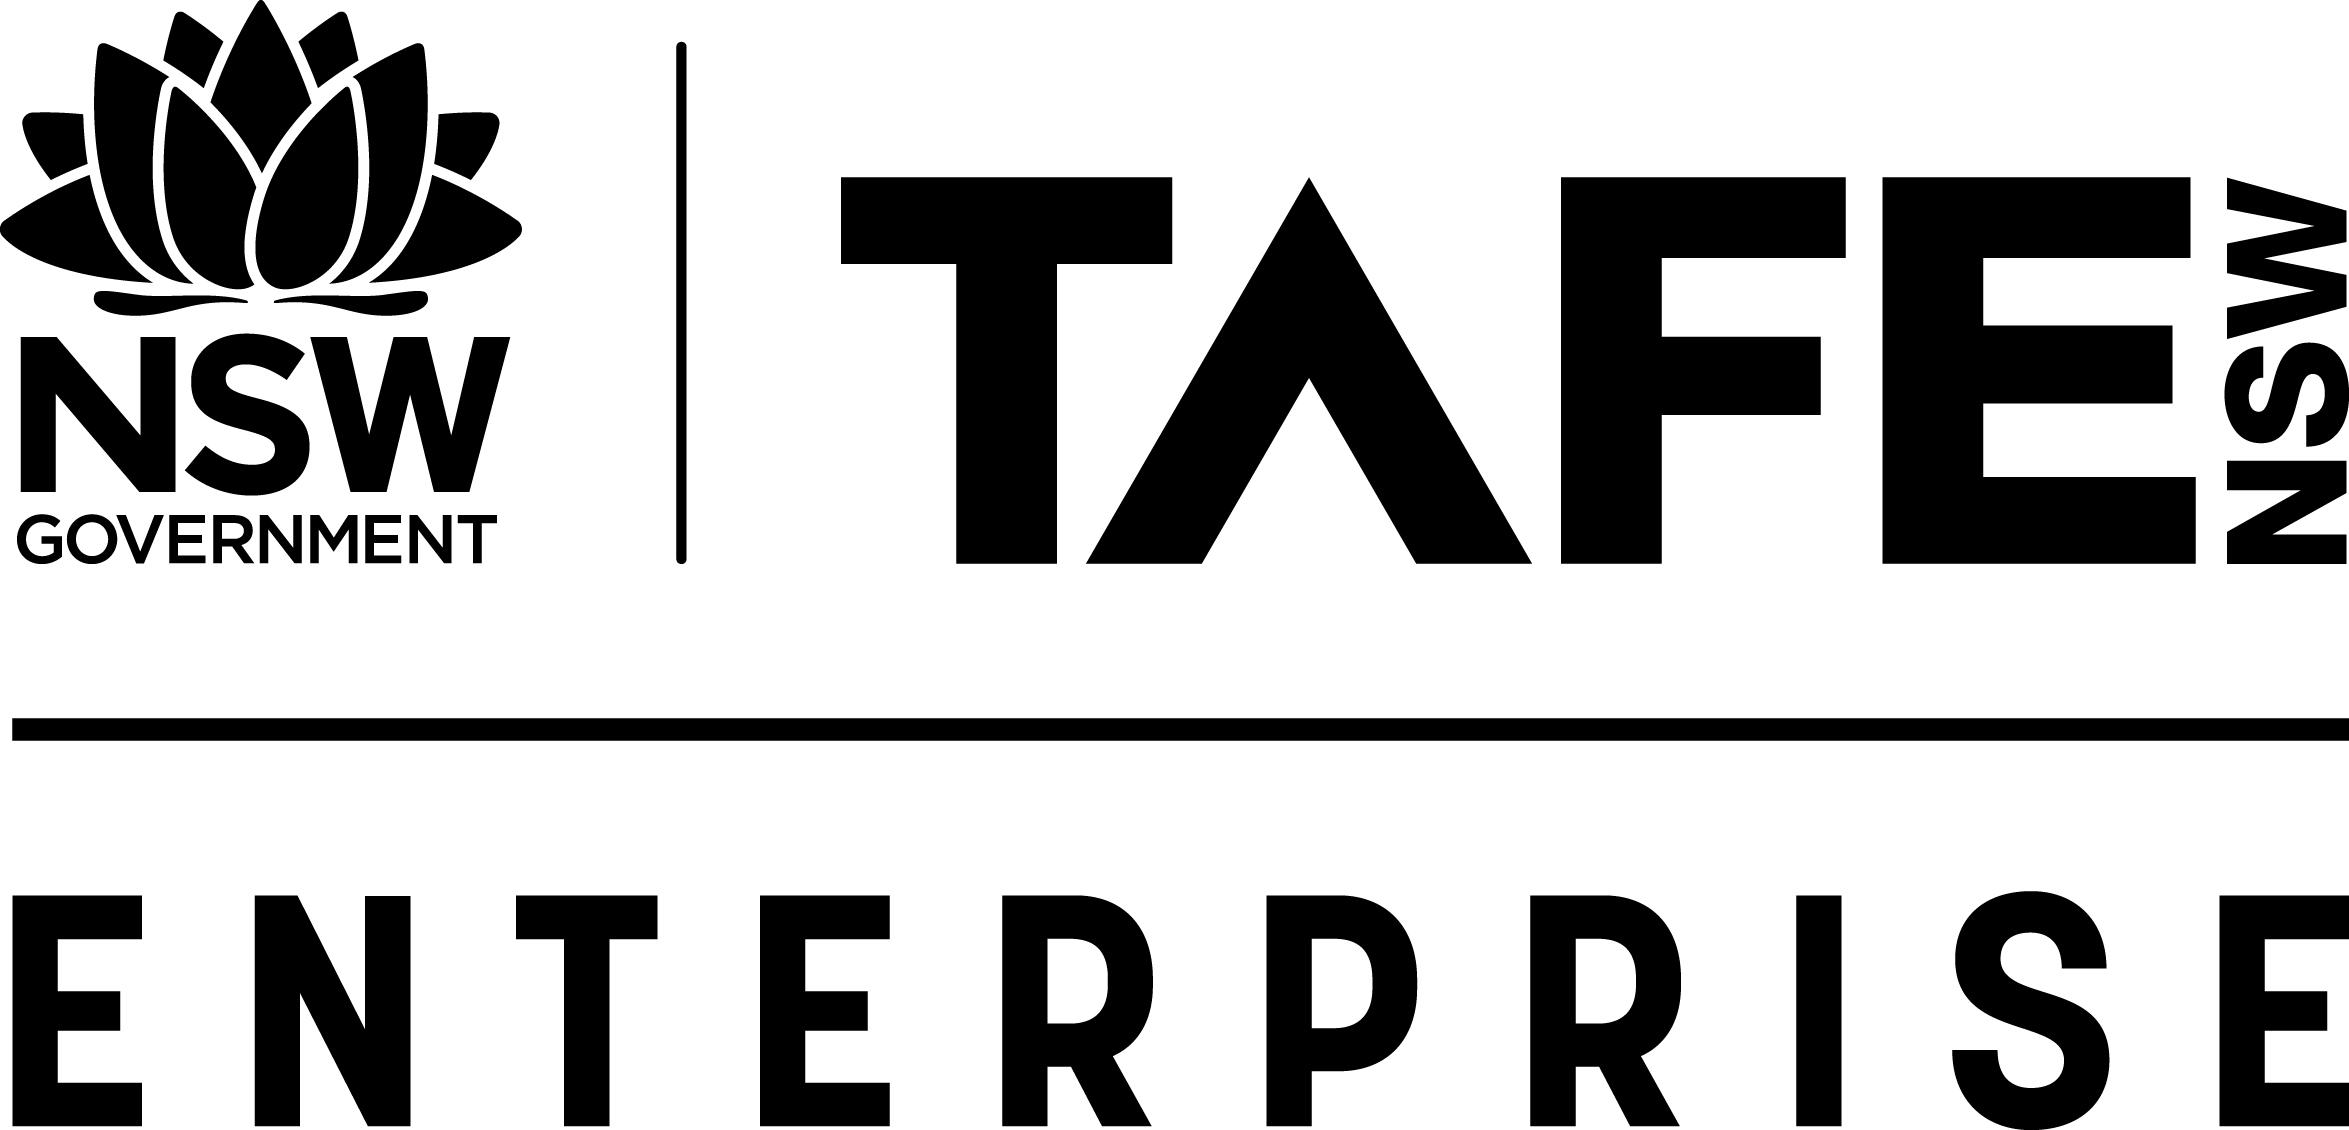 TAFENSW_ENTERPRISE_BLACK STACKED NEW.jpg